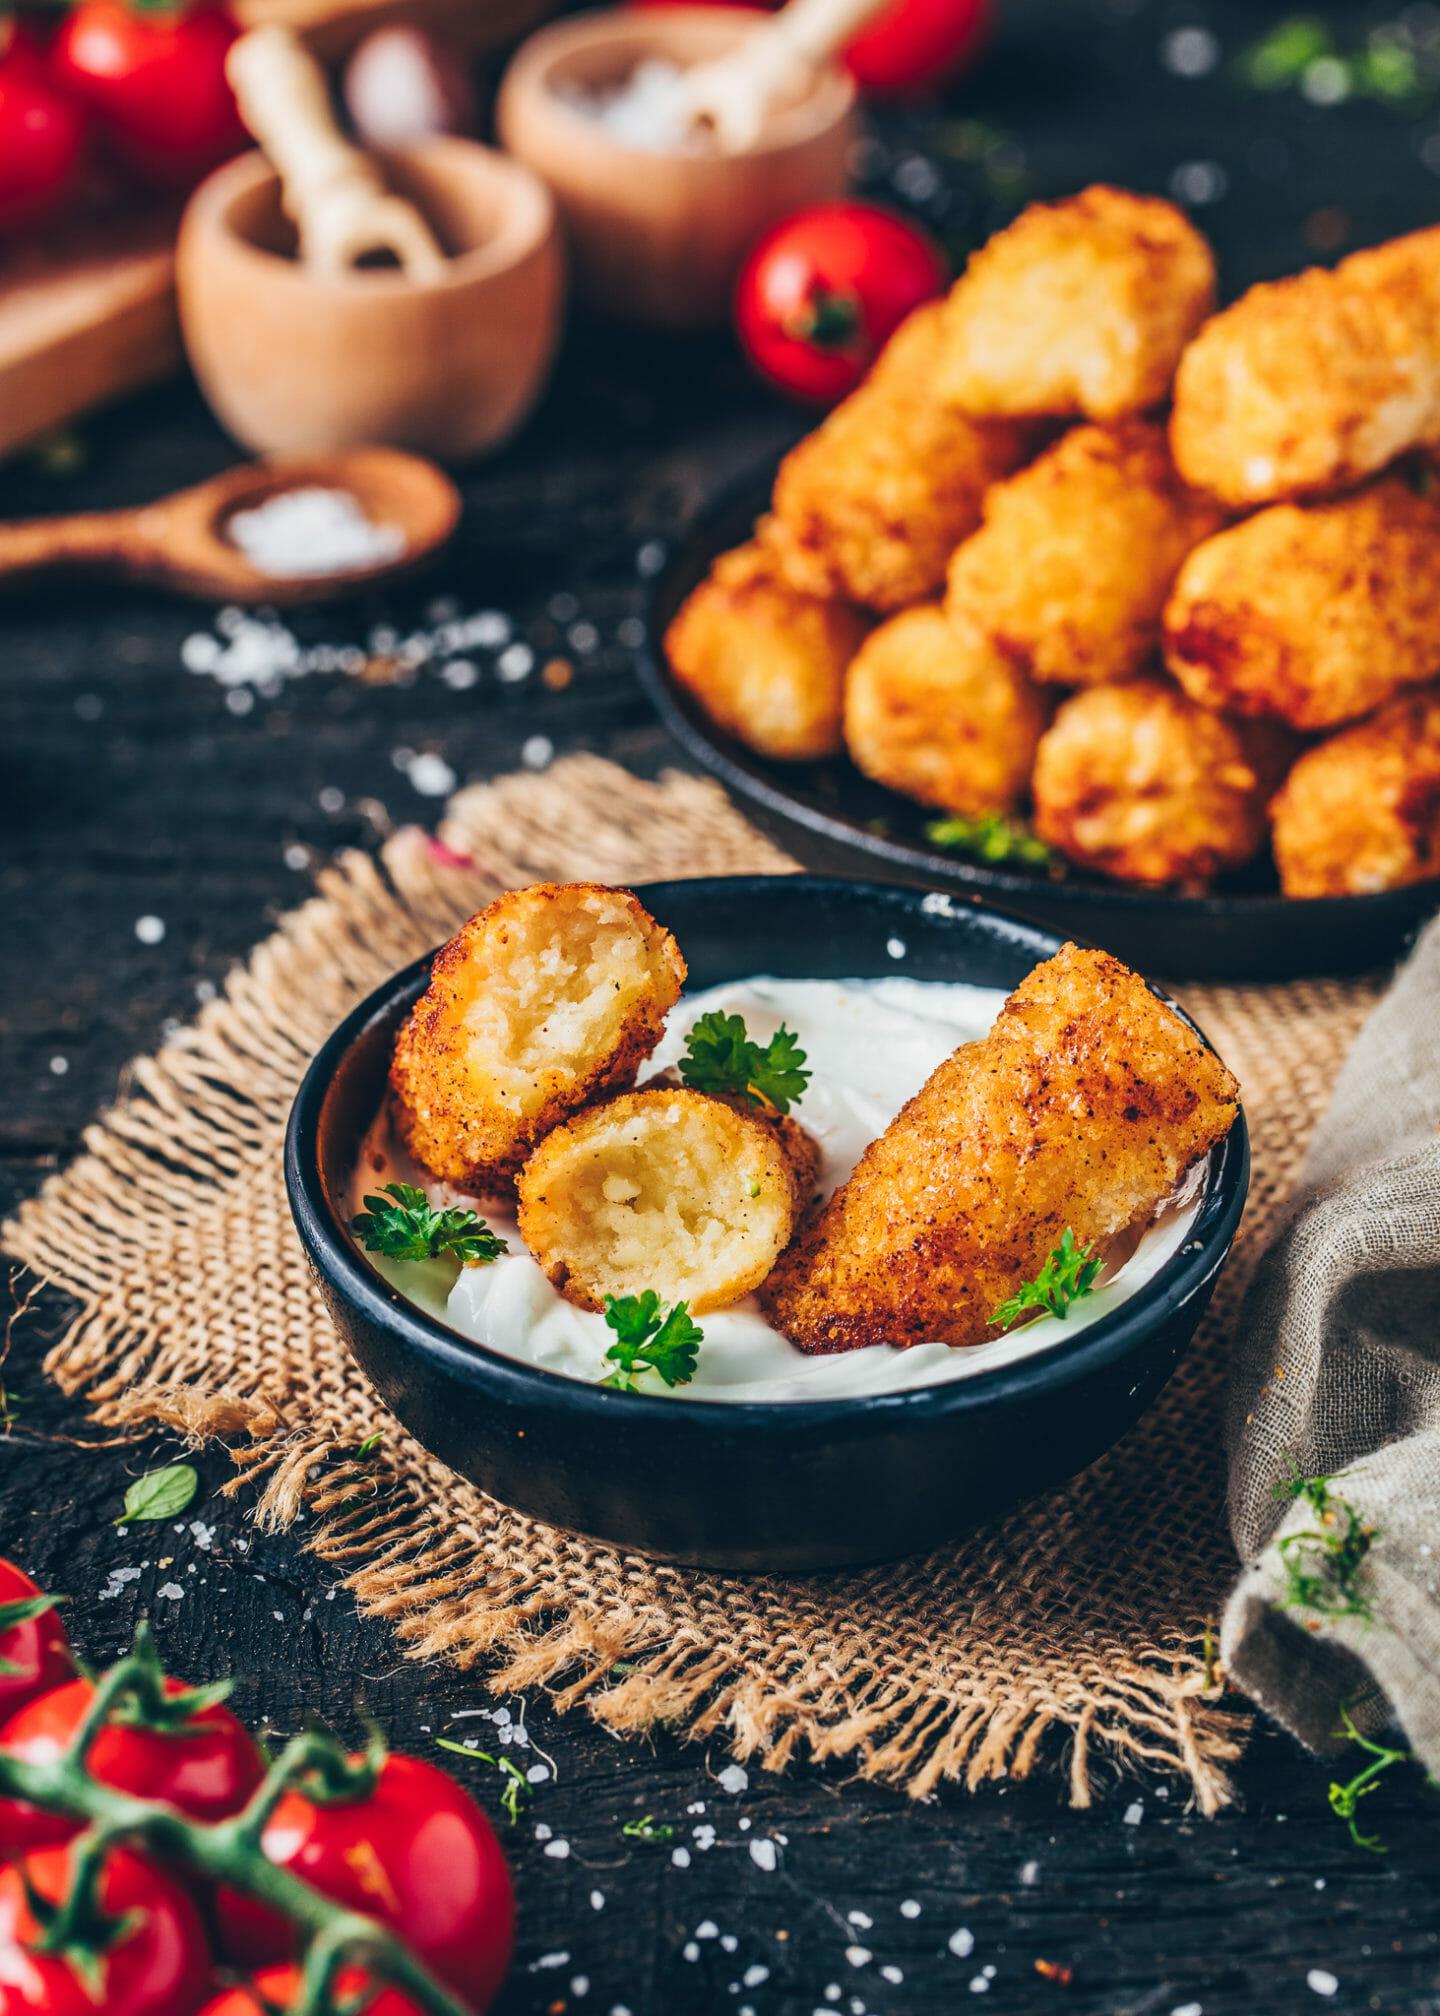 Potato Croquettes with cashew dip (homemade, easy, vegan, gluten-free)